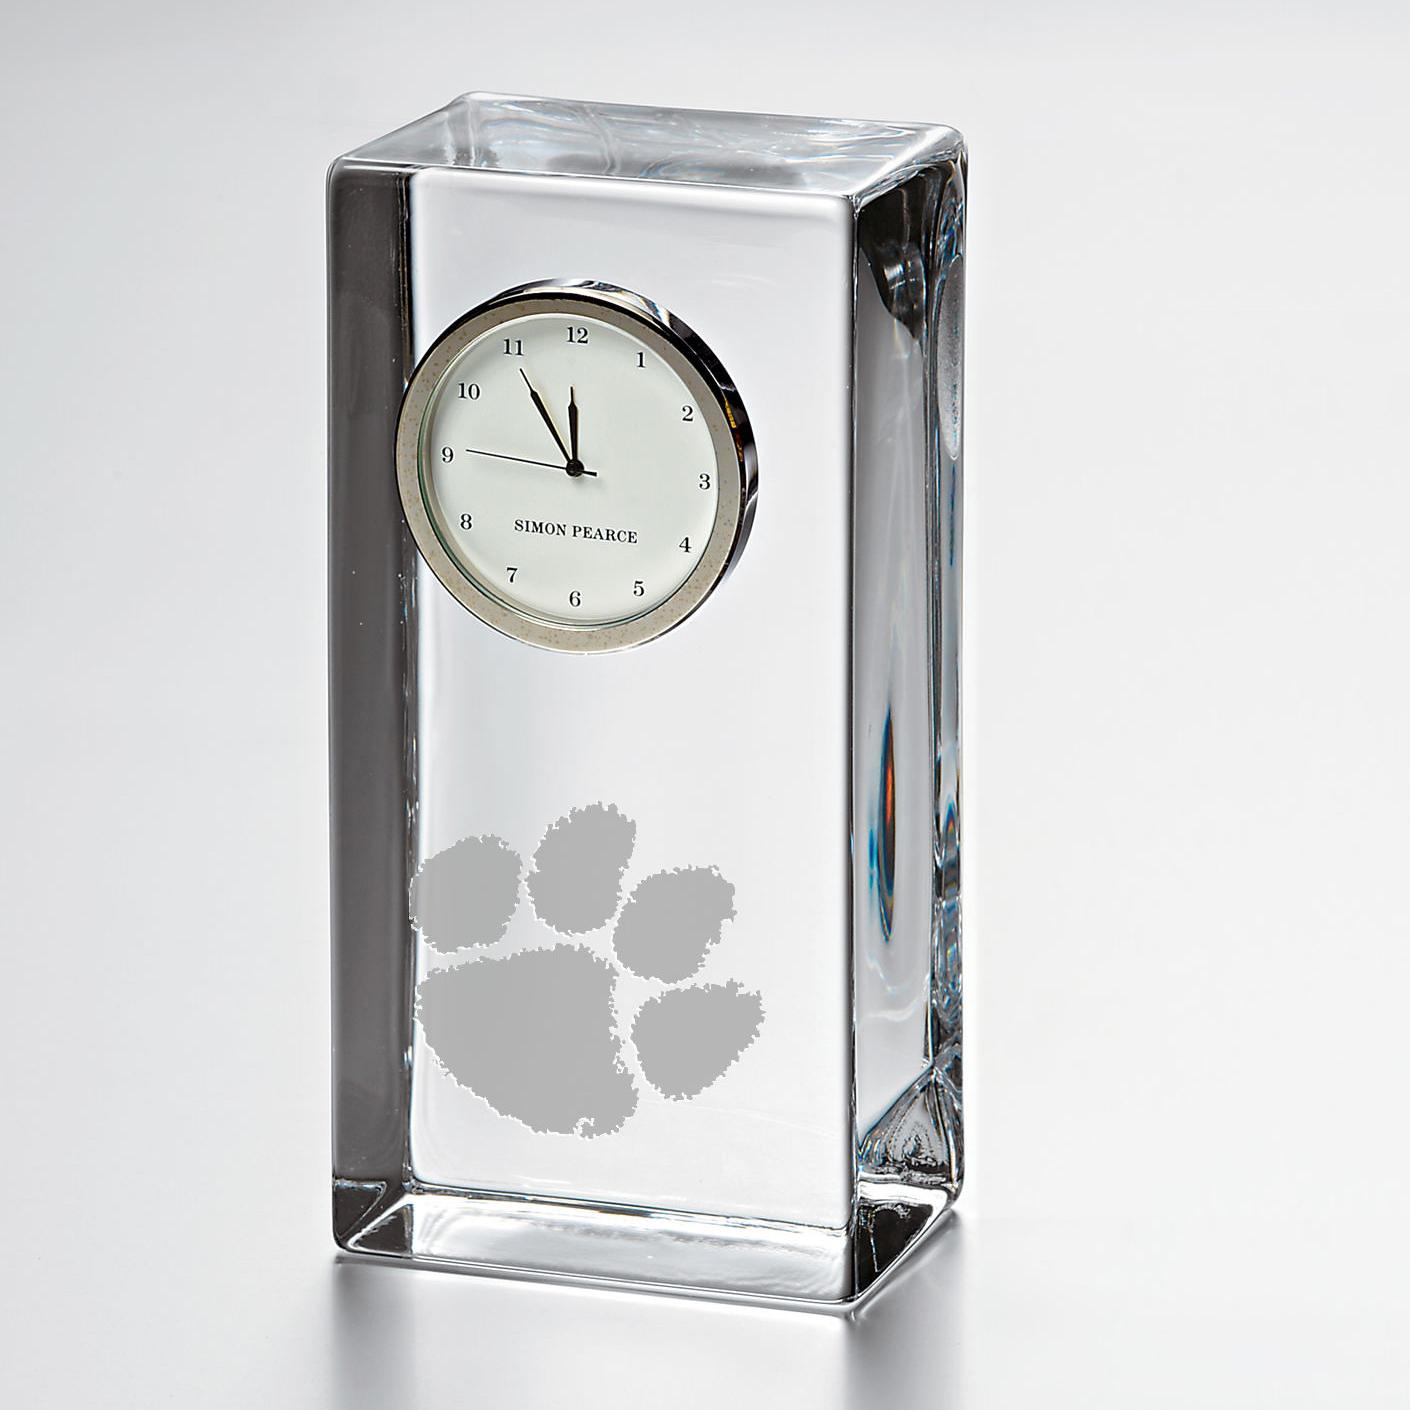 Clemson Tall Glass Desk Clock  by Simon Pearce